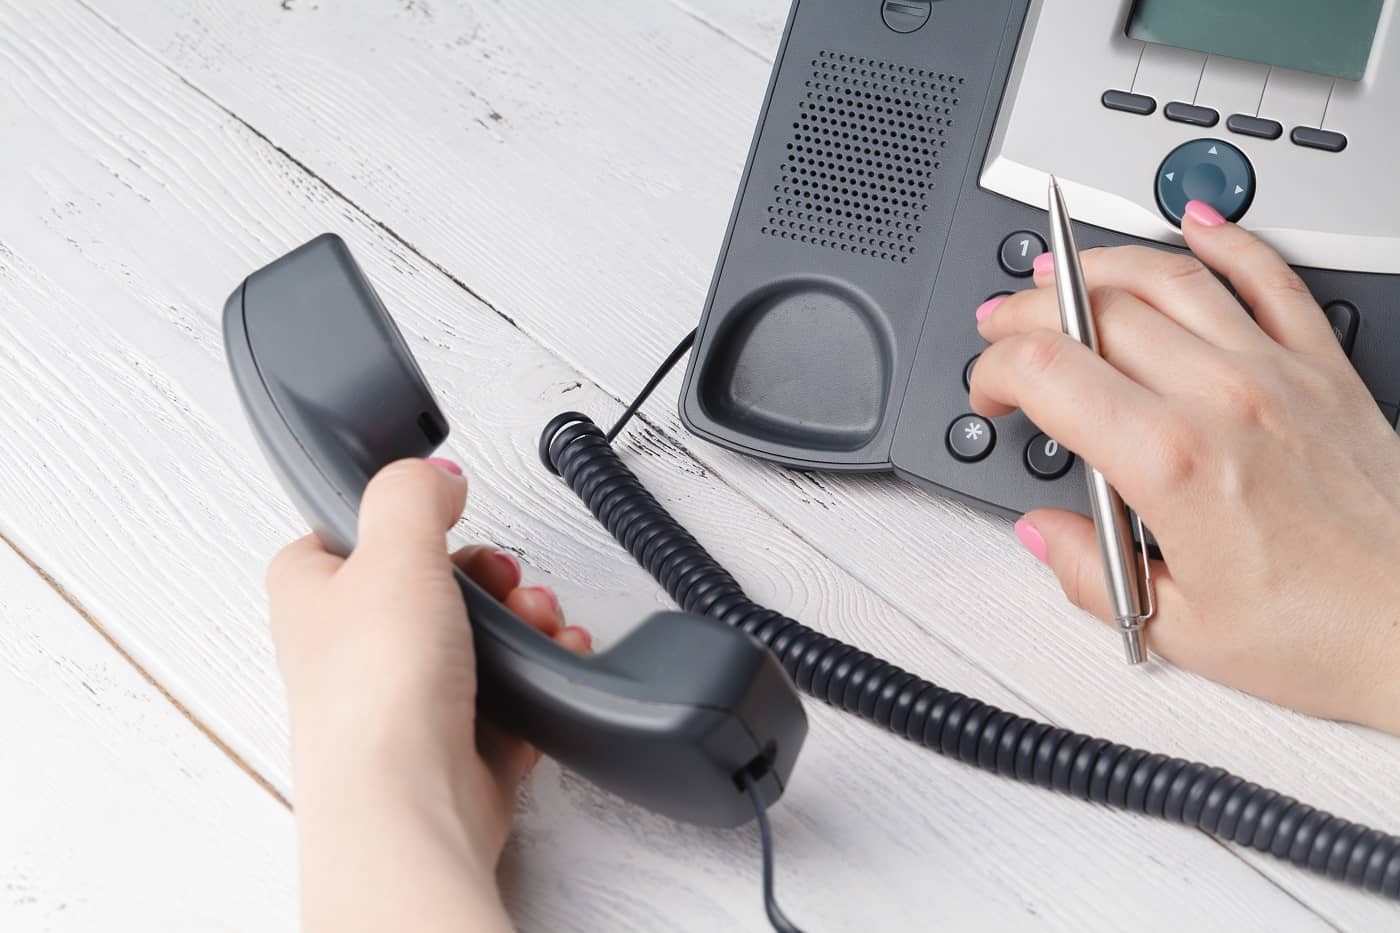 Reclamaciones Jazztel llamada telefónica